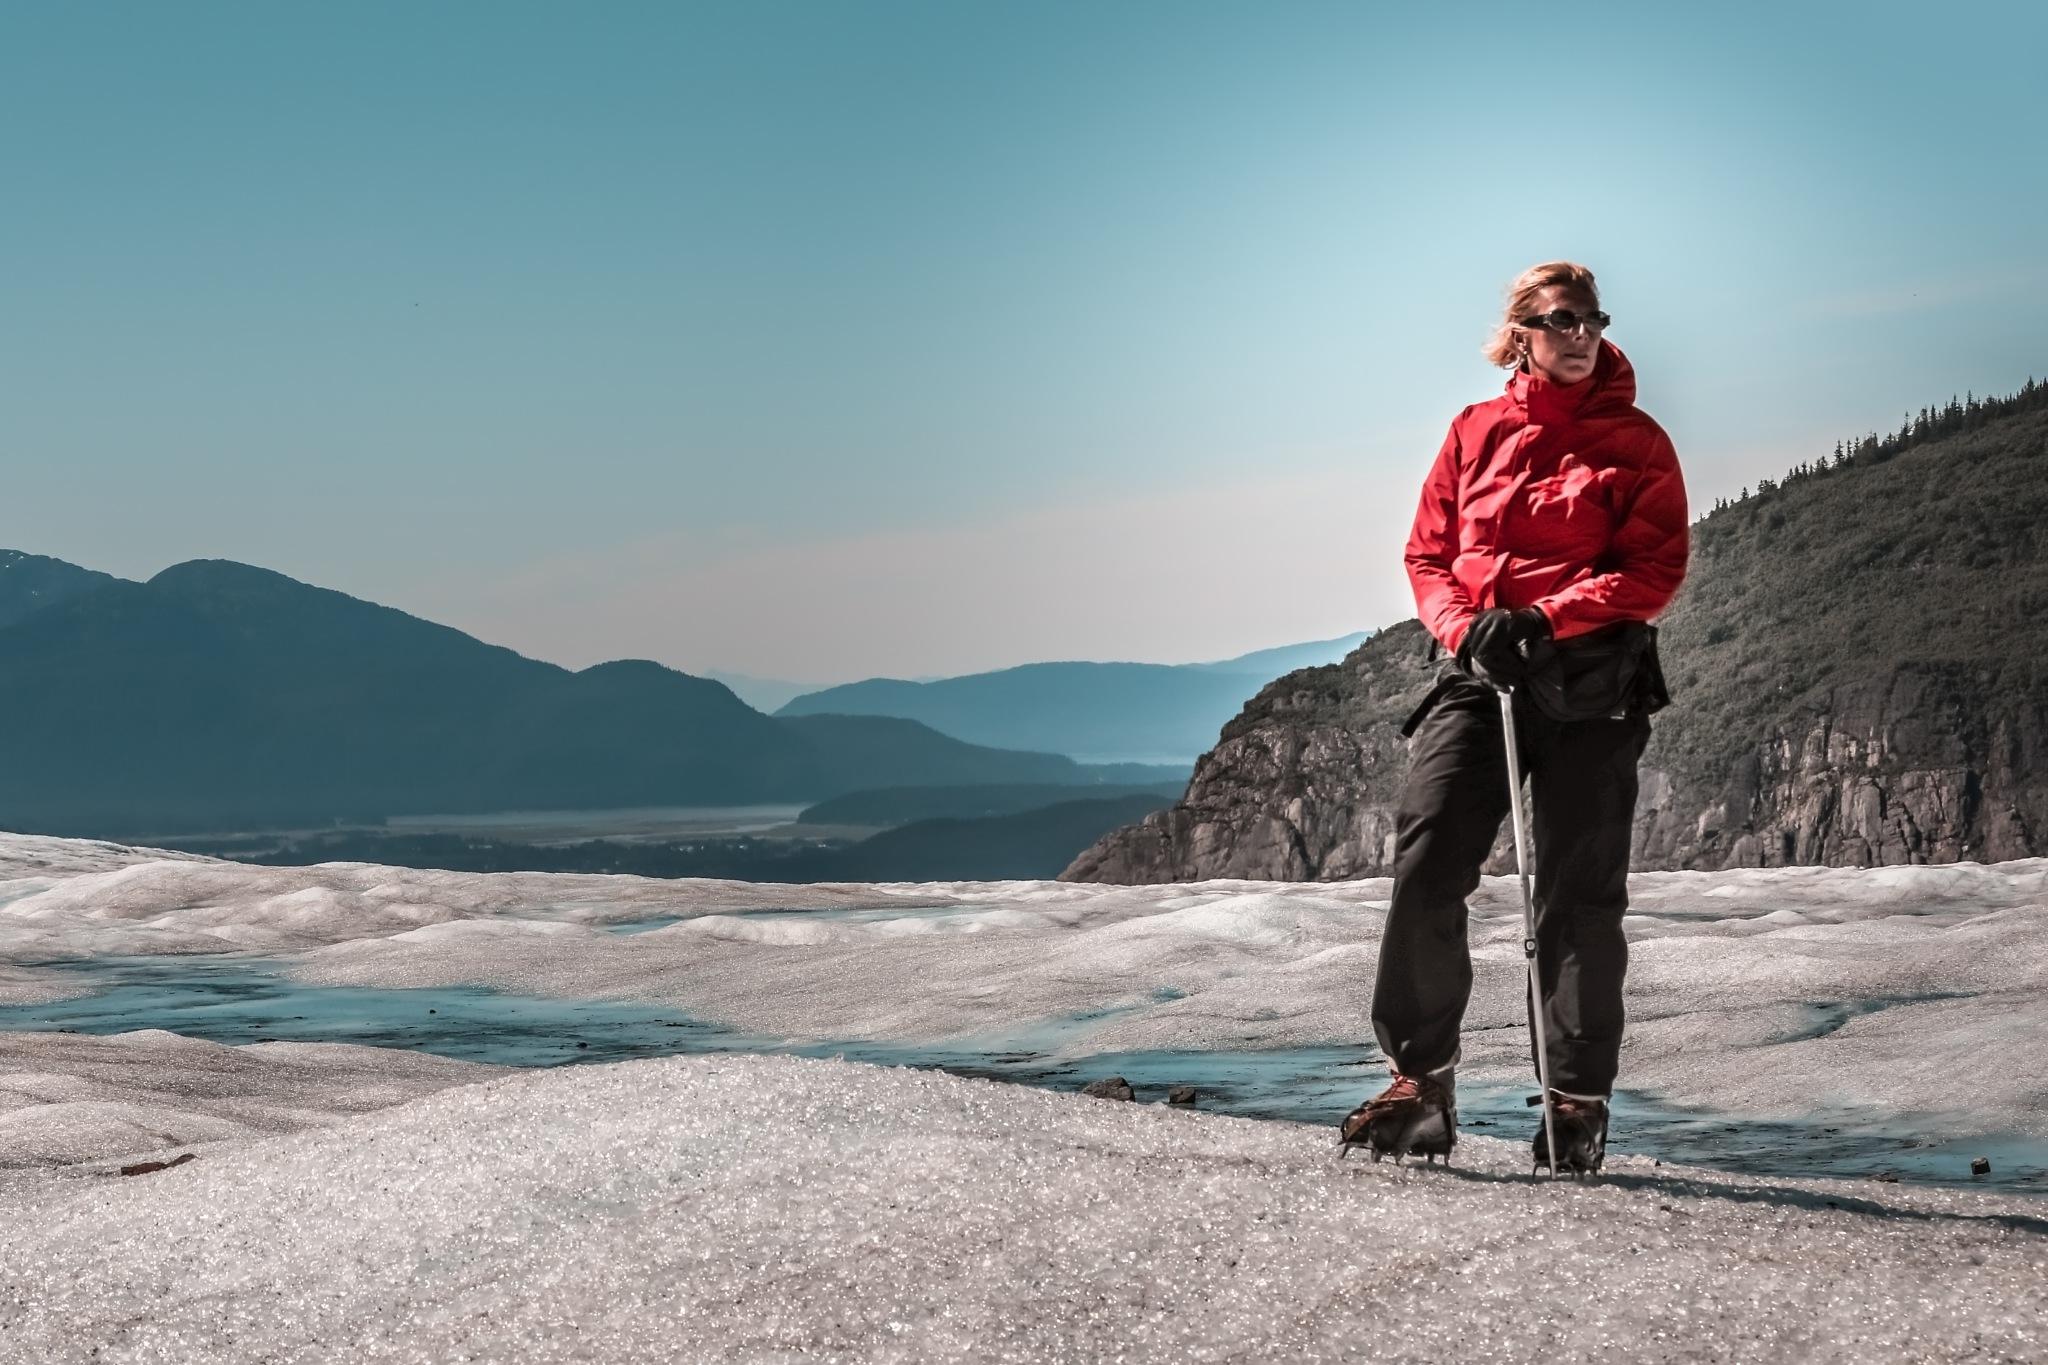 Glacier hike by Martina Birnbaum